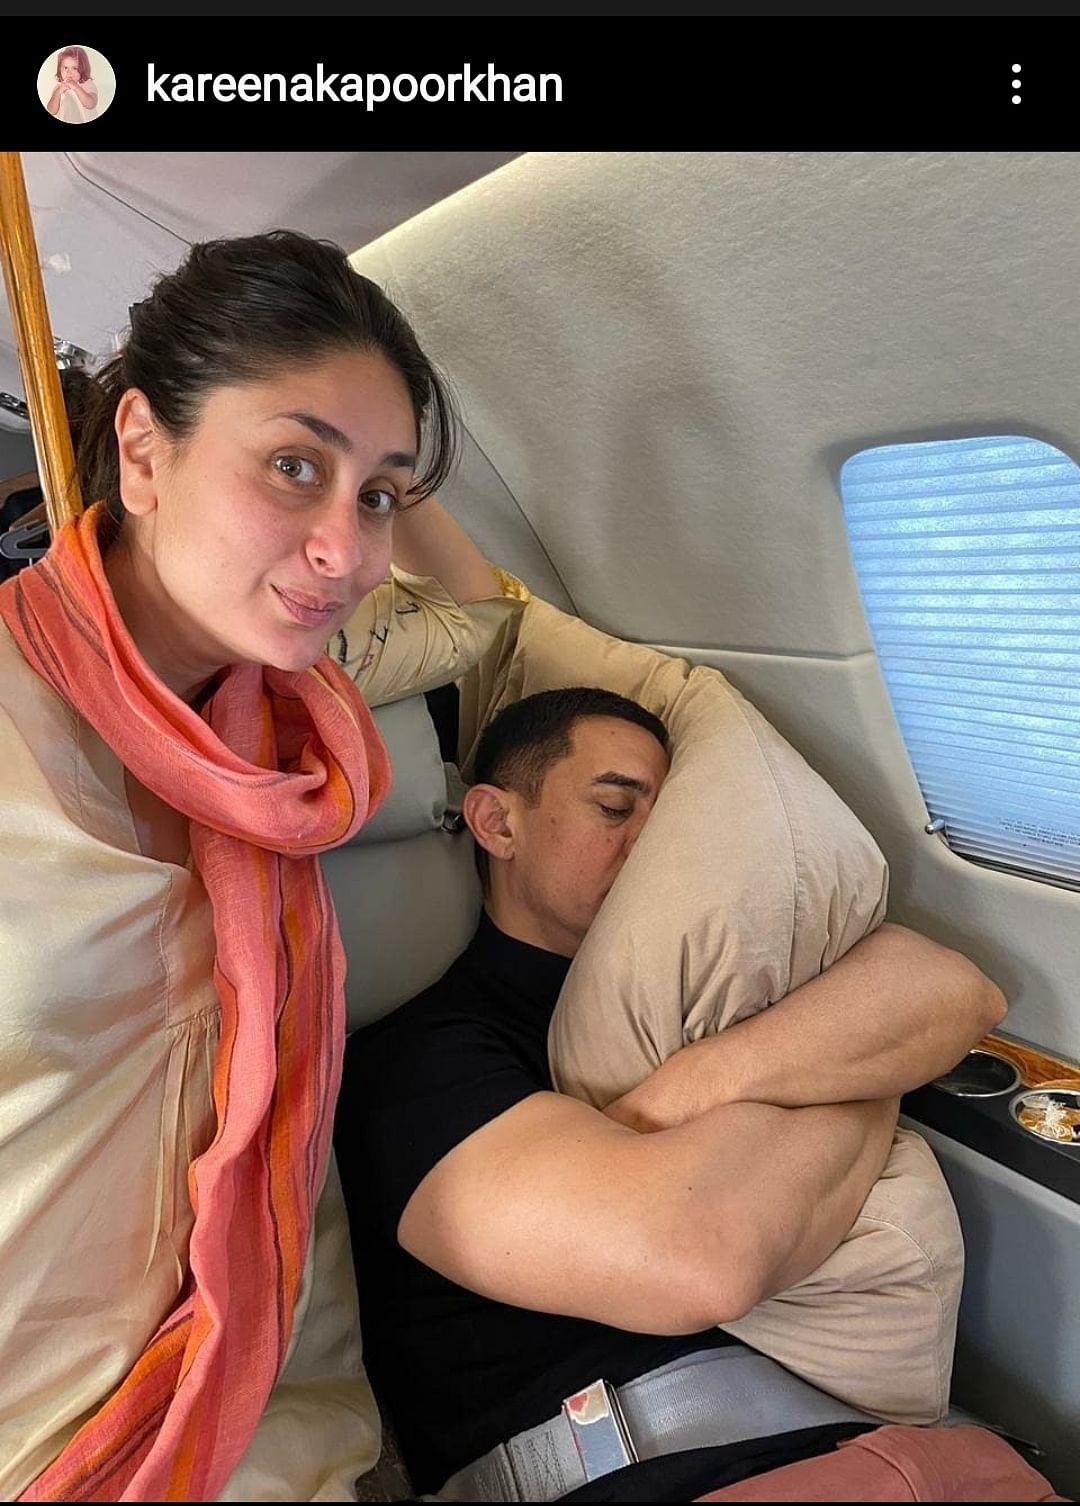 """My fav co-star has to be @_aamirkhan's... pillow! ❤️🤭"" - Kareena Kapoor Khan"